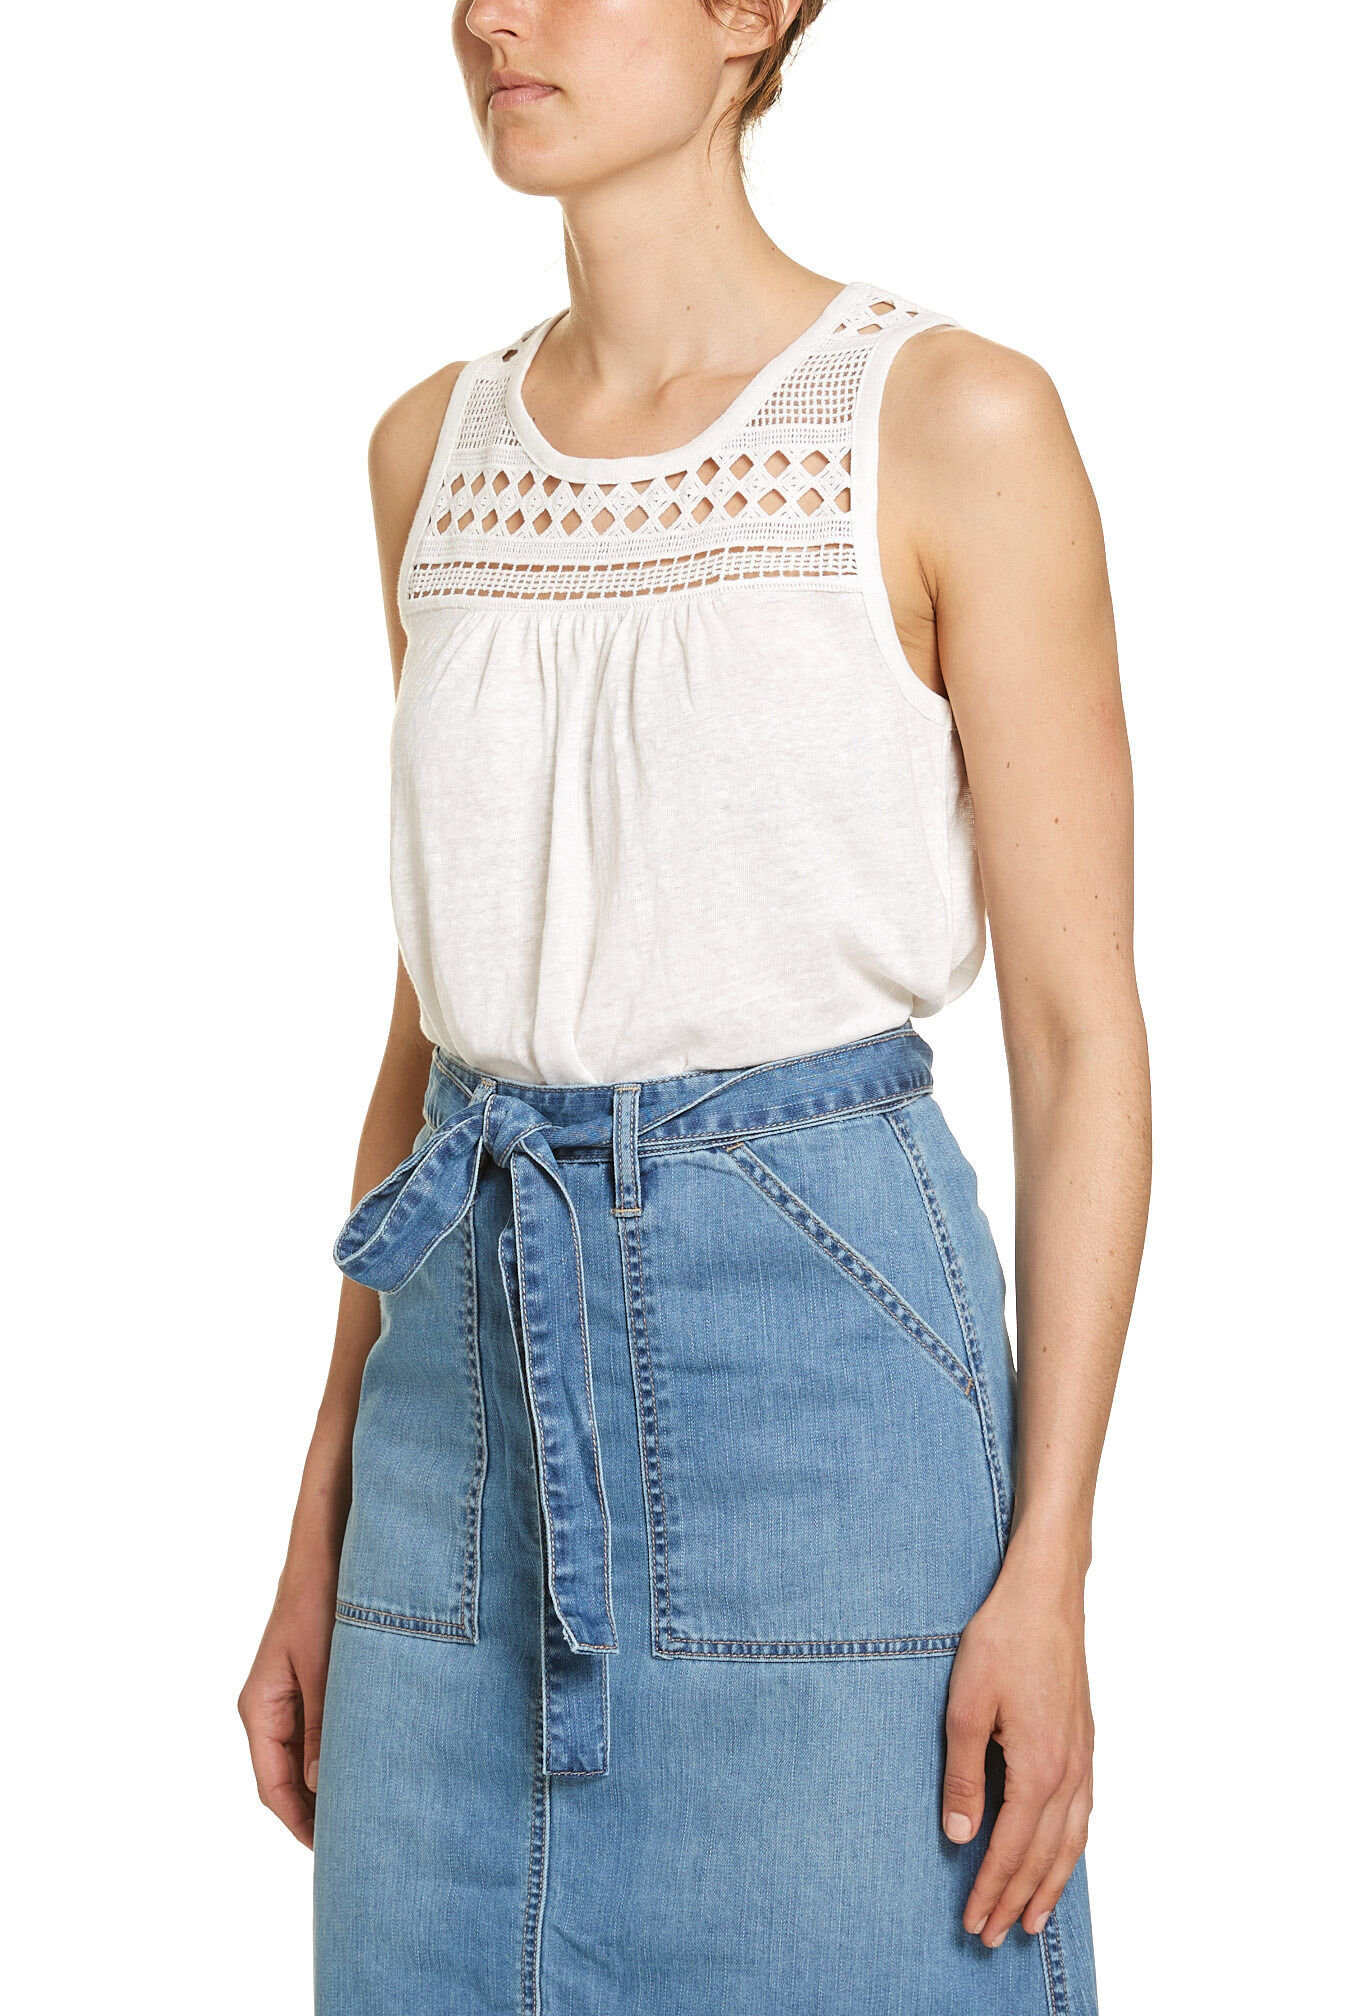 NEW-JAG-WOMENS-LACE-YOKE-TEE-T-Shirts